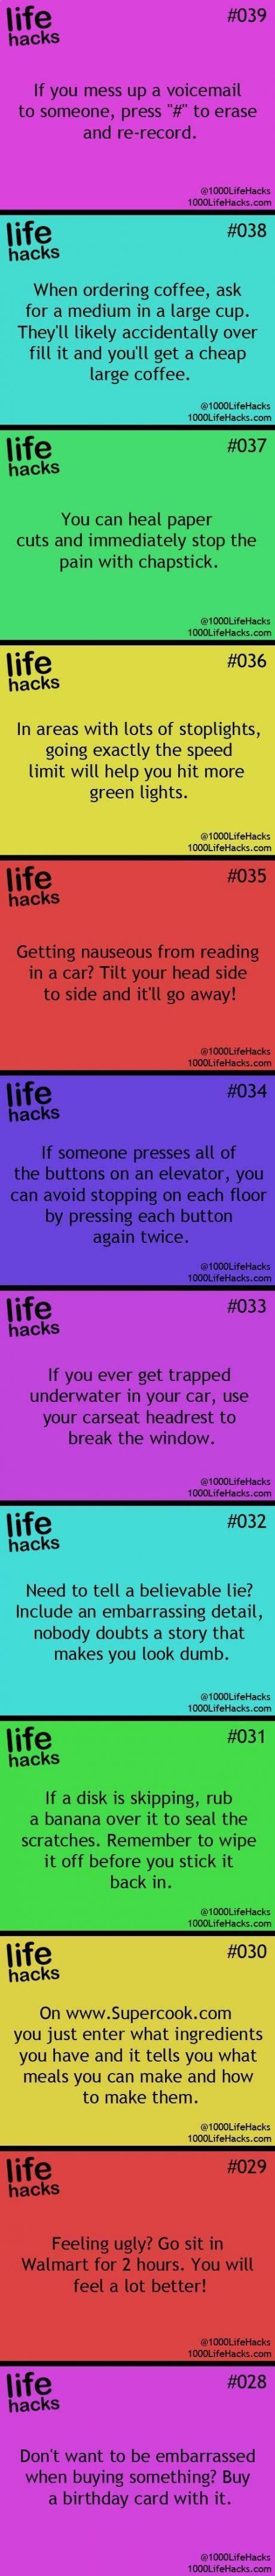 Random Life Facts